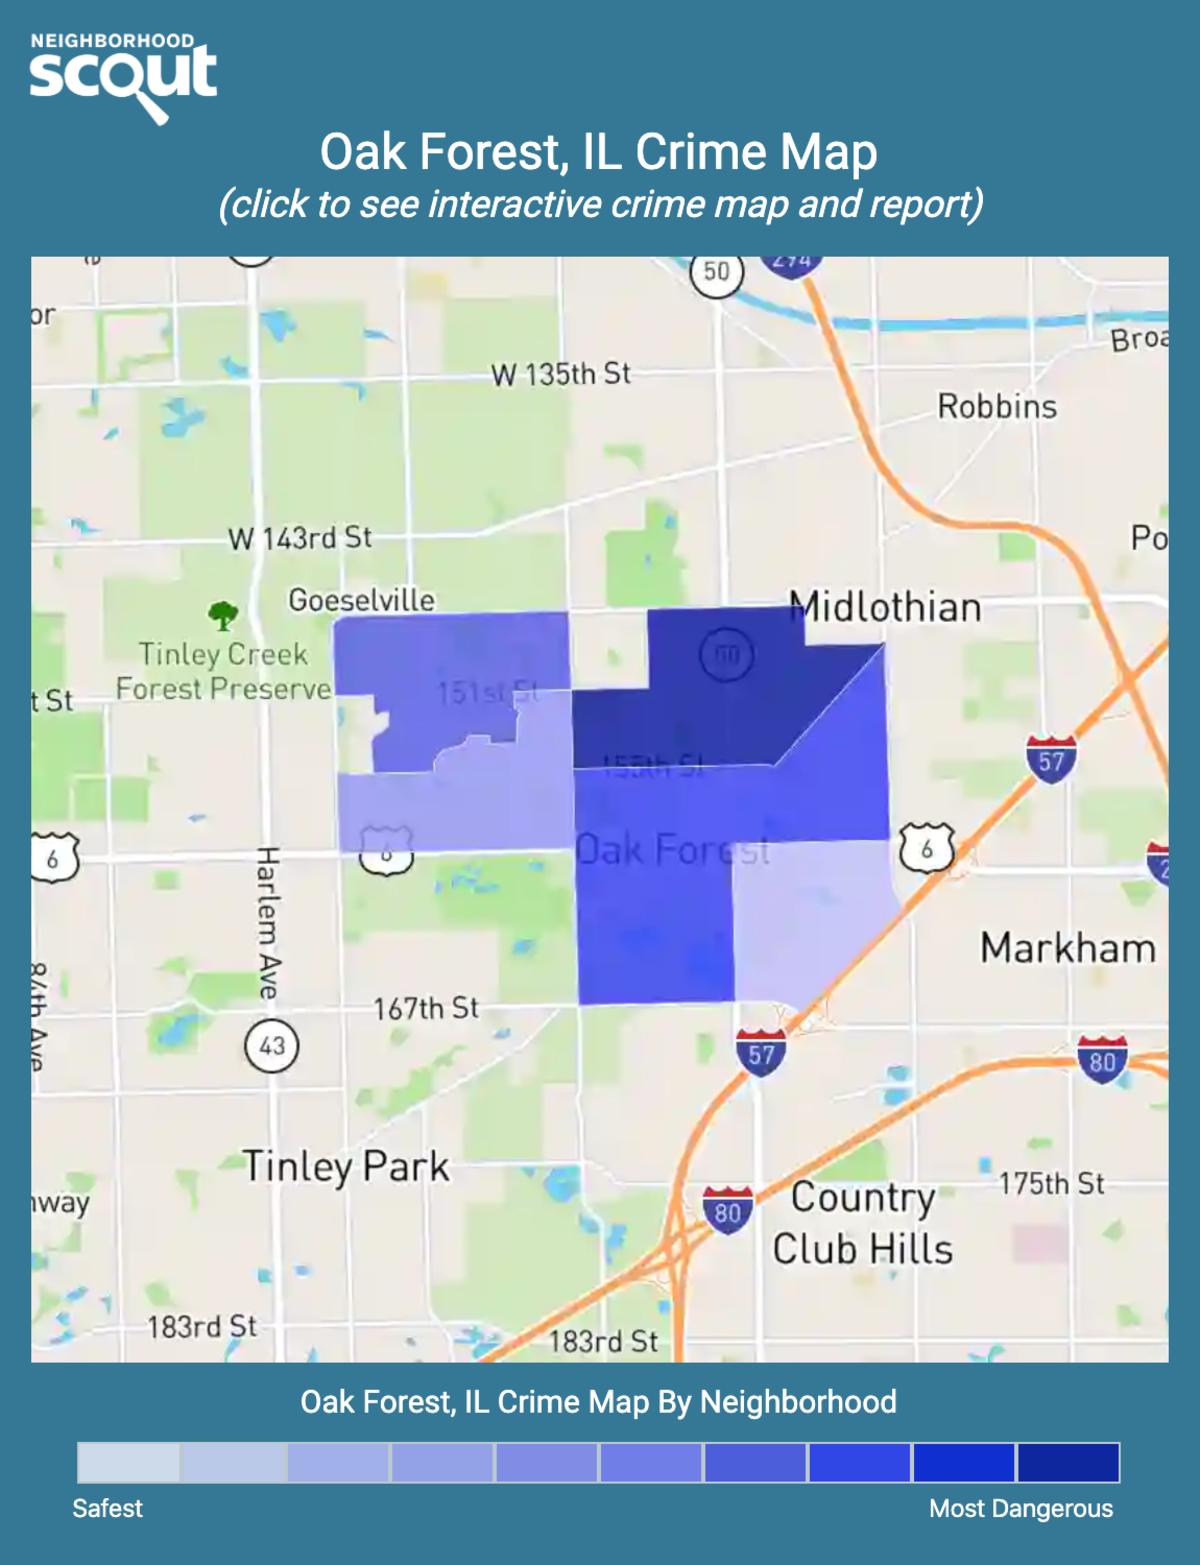 Oak Forest, Illinois crime map